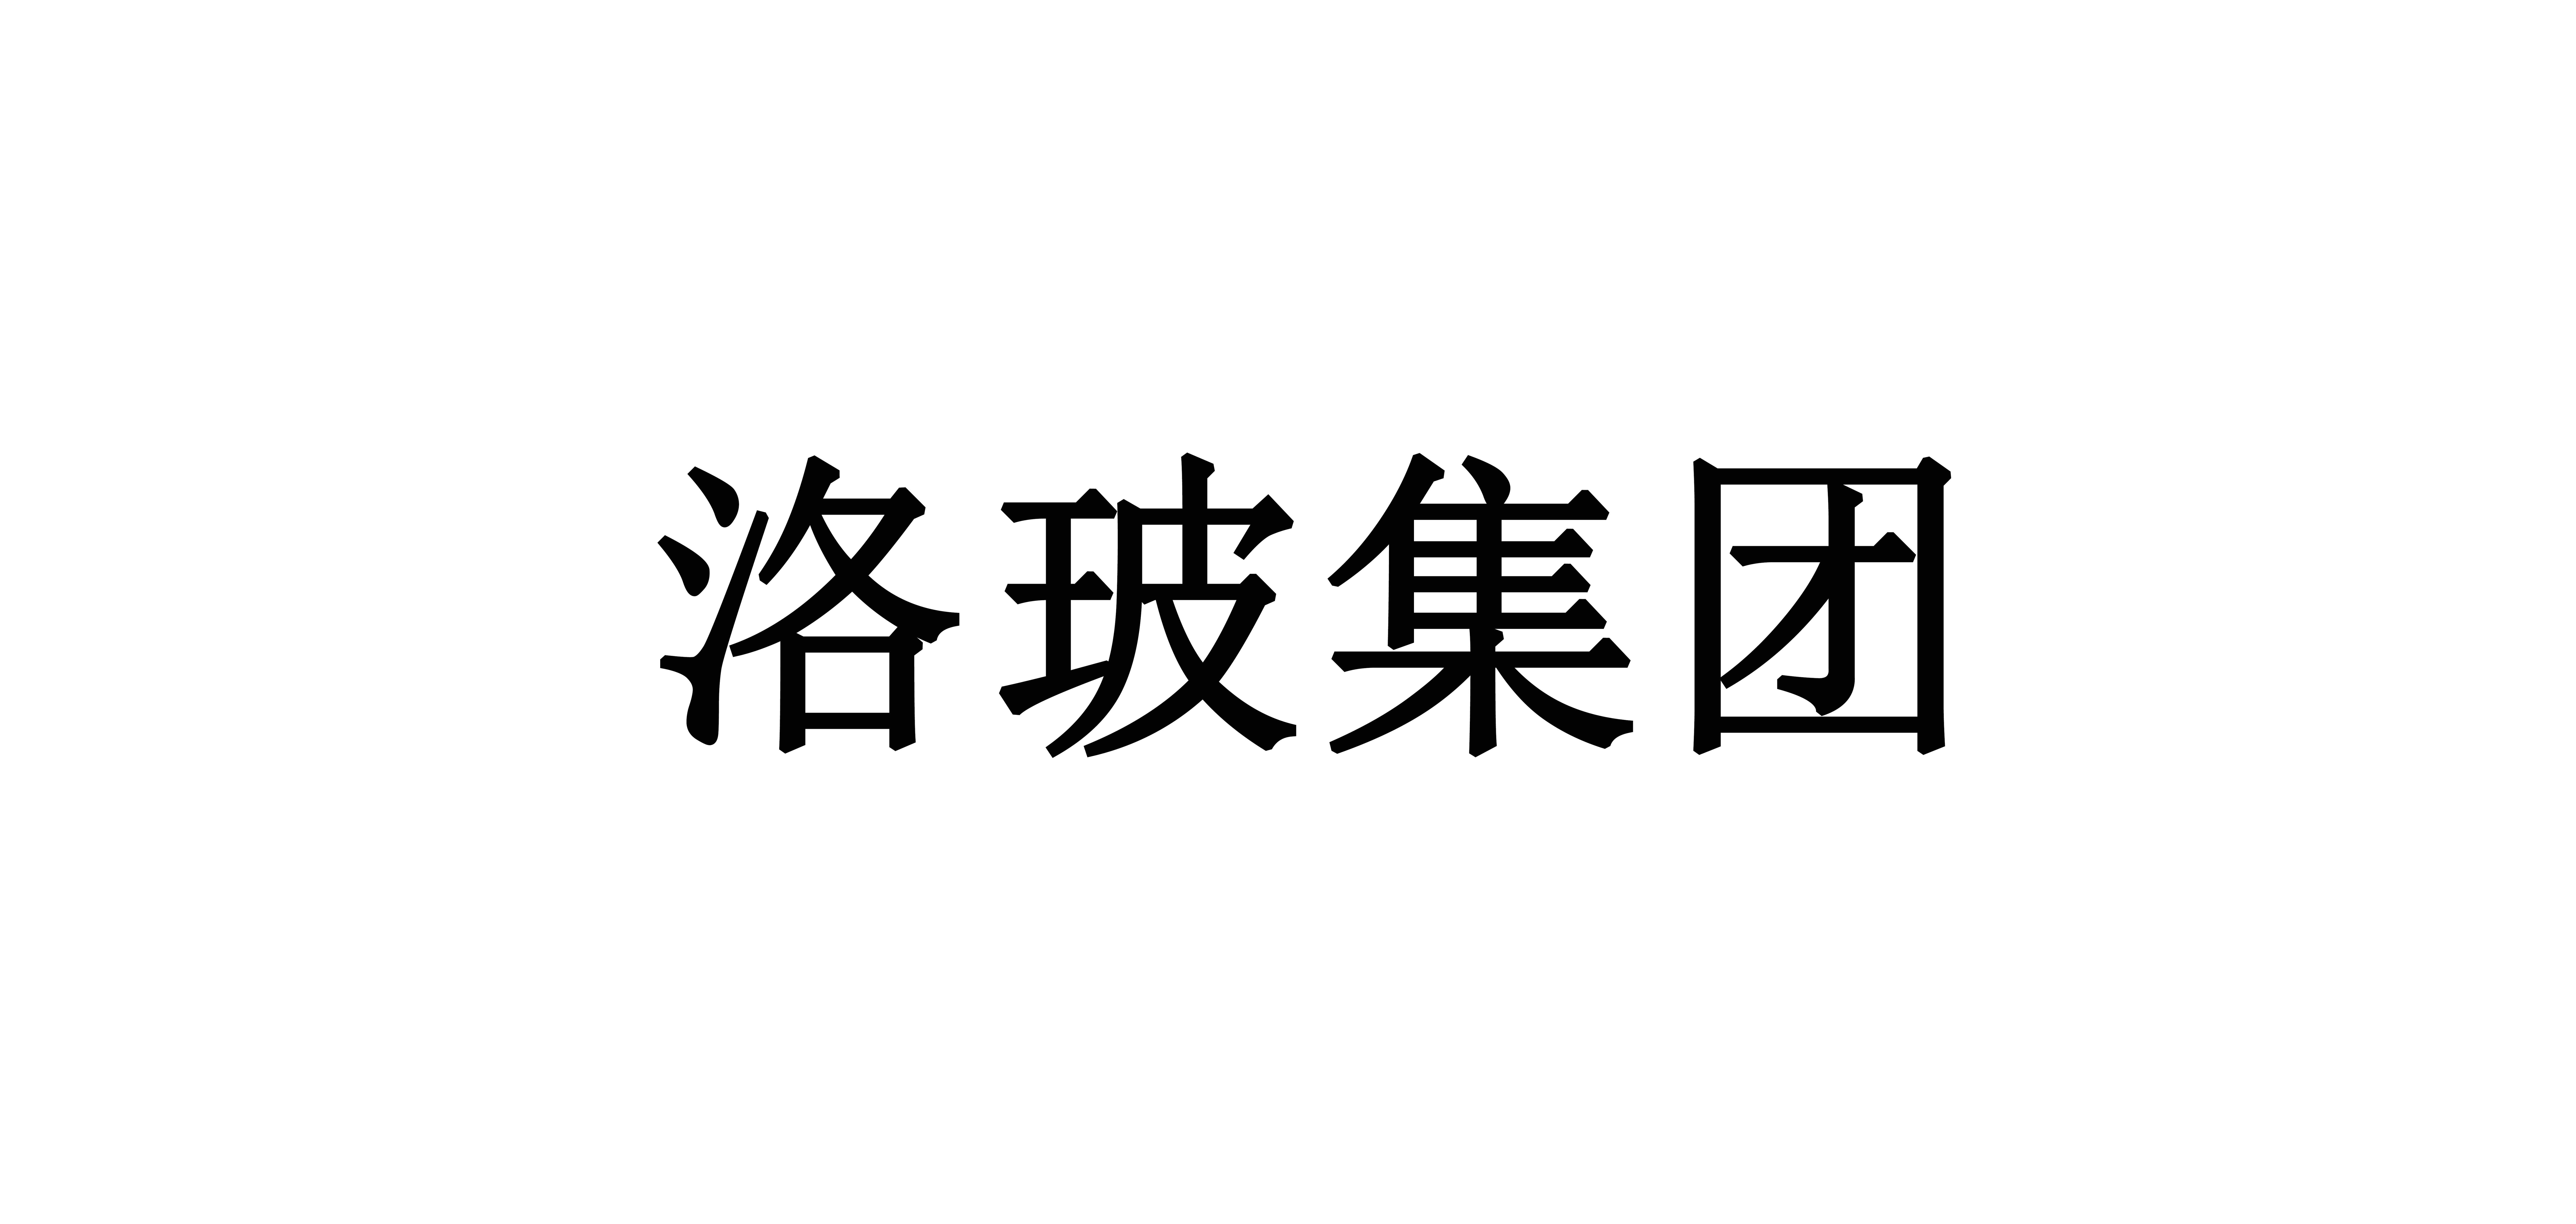 洛玻/CLFG